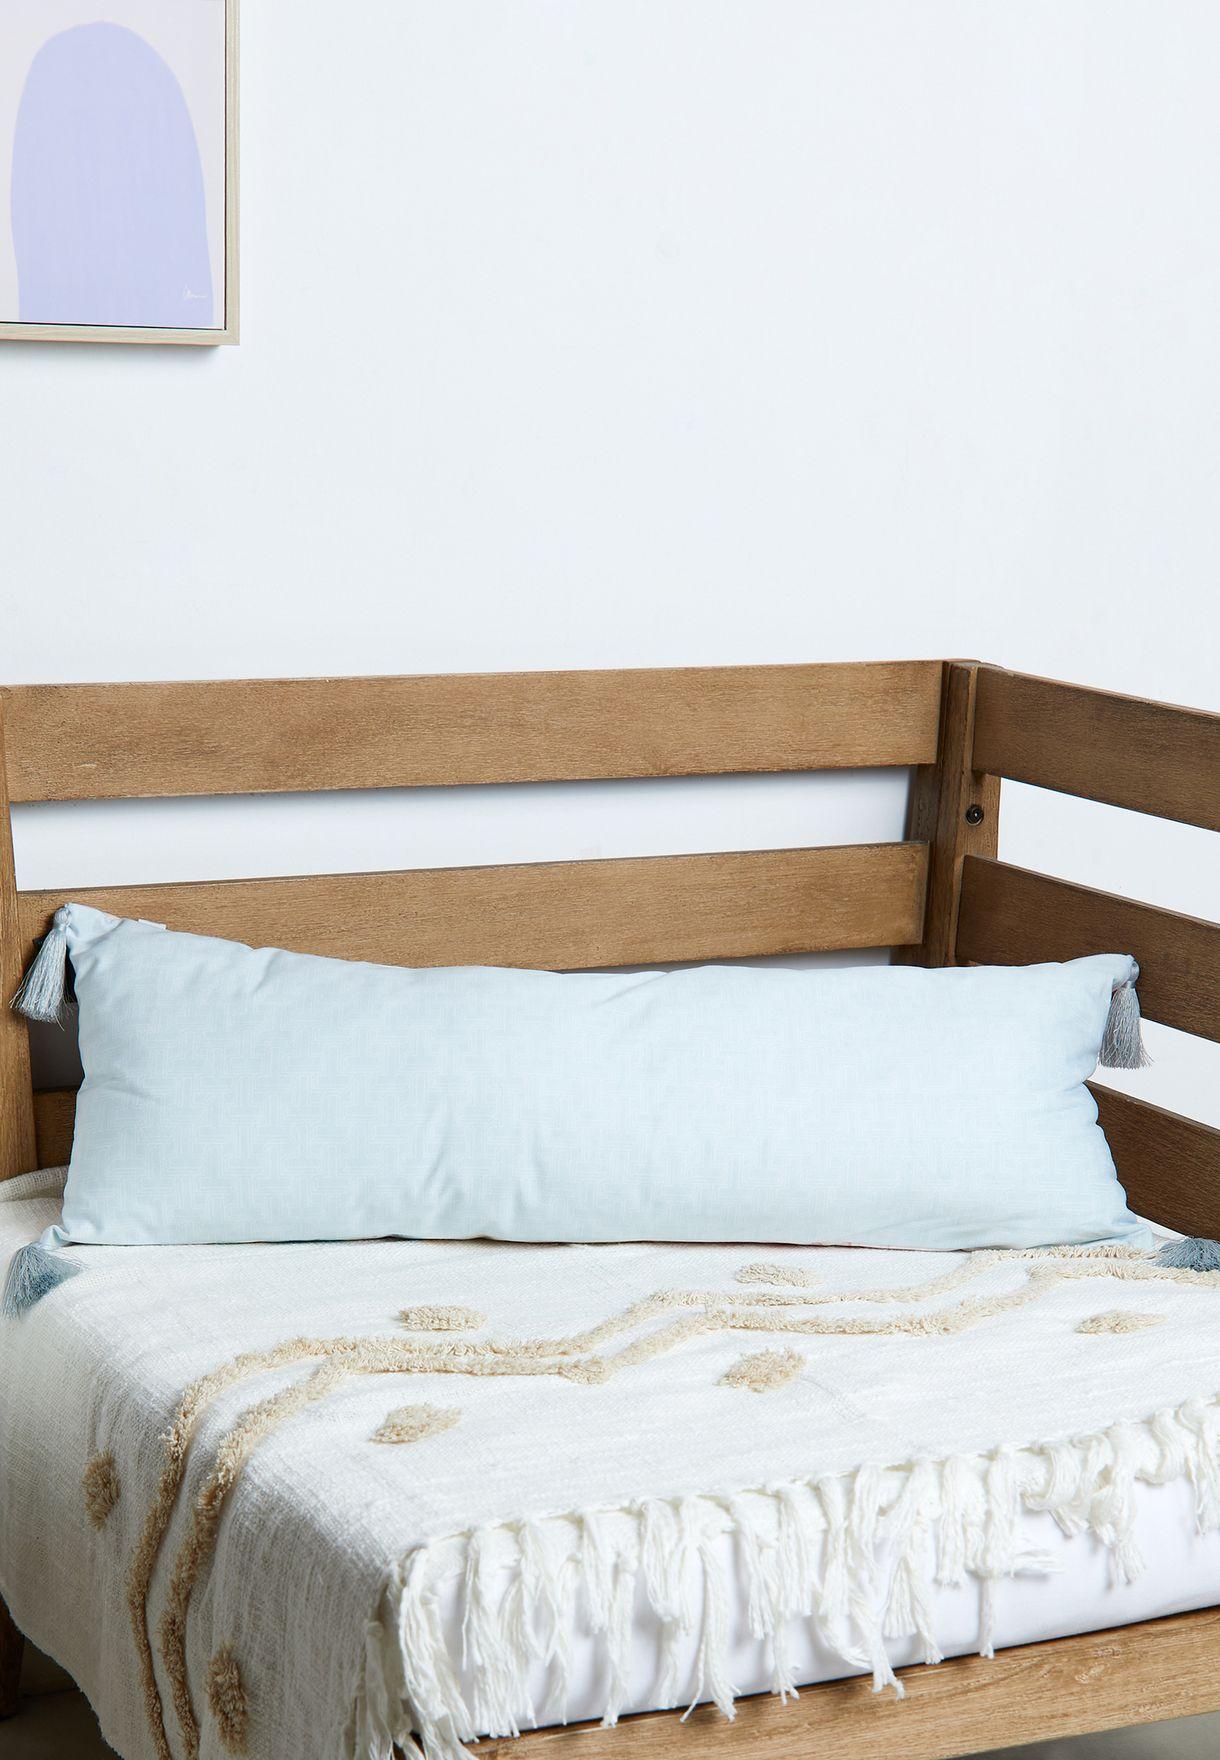 Prefilled Polyester Filled Cushion 30cm x 80cm